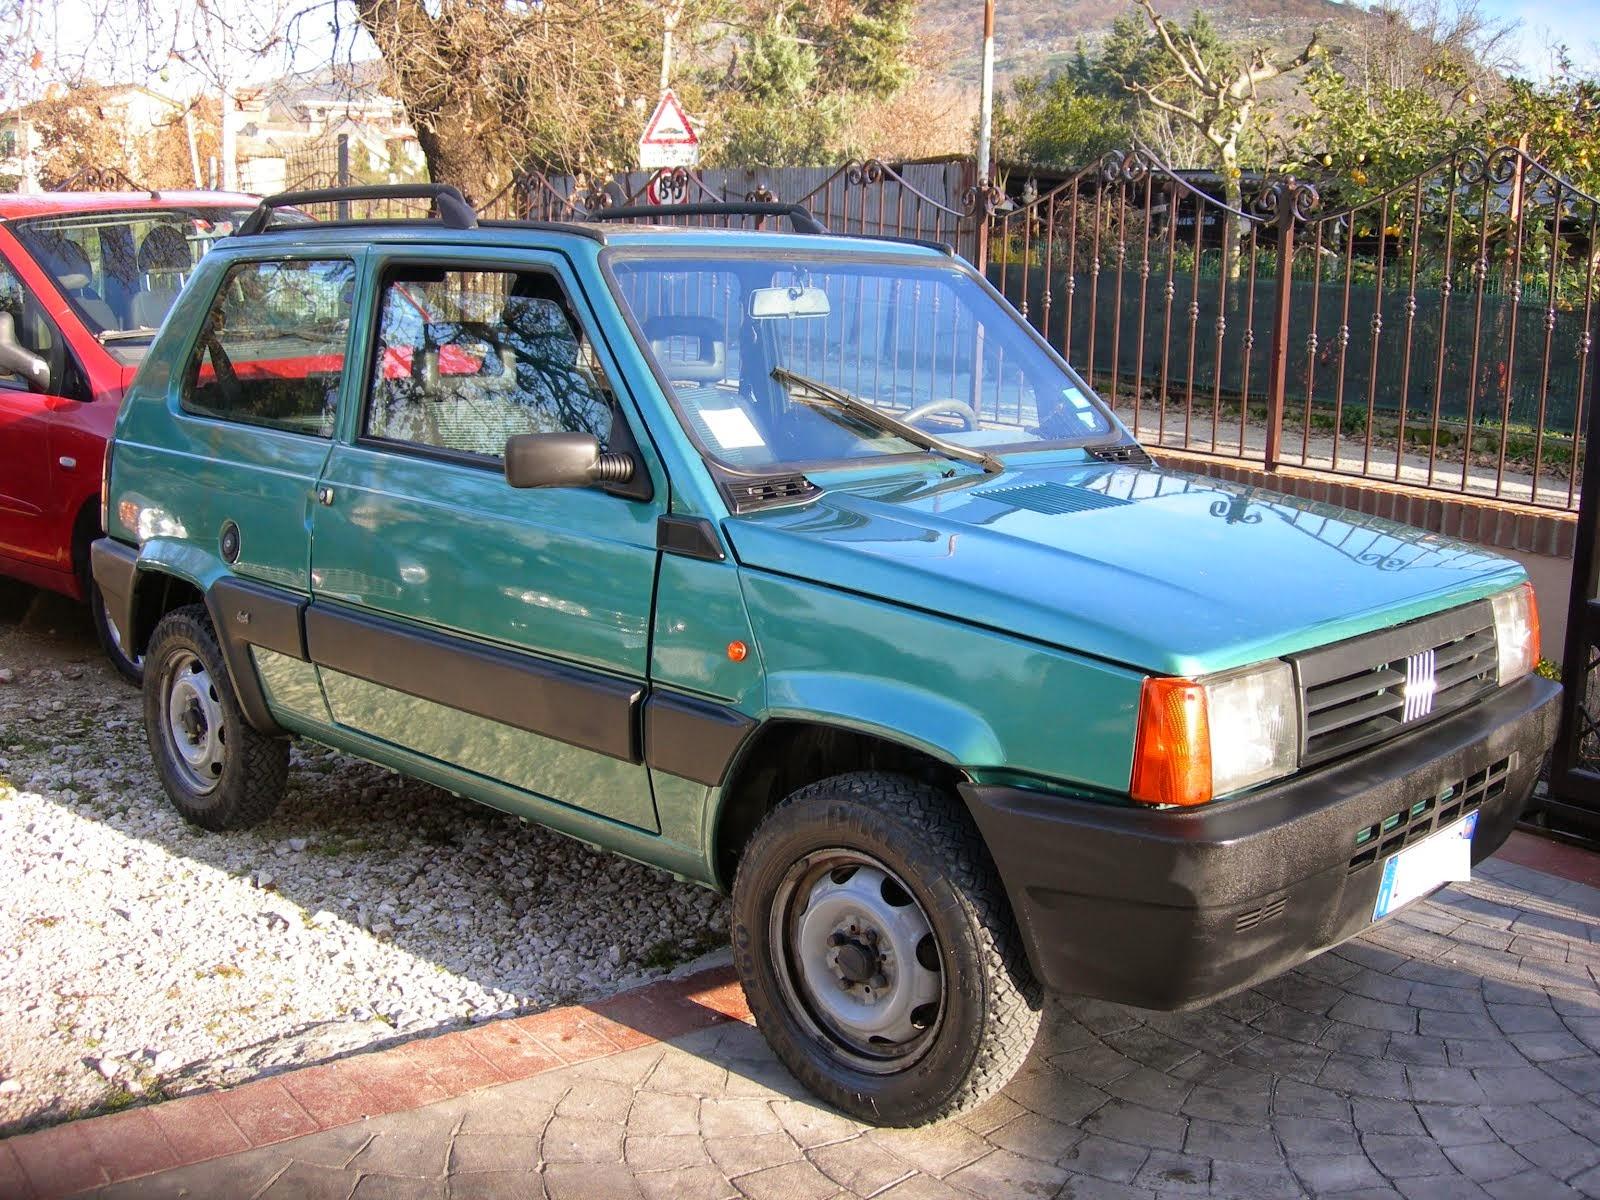 Fiat Panda 1.1 Trekking 4x4 Metano Anno 2000